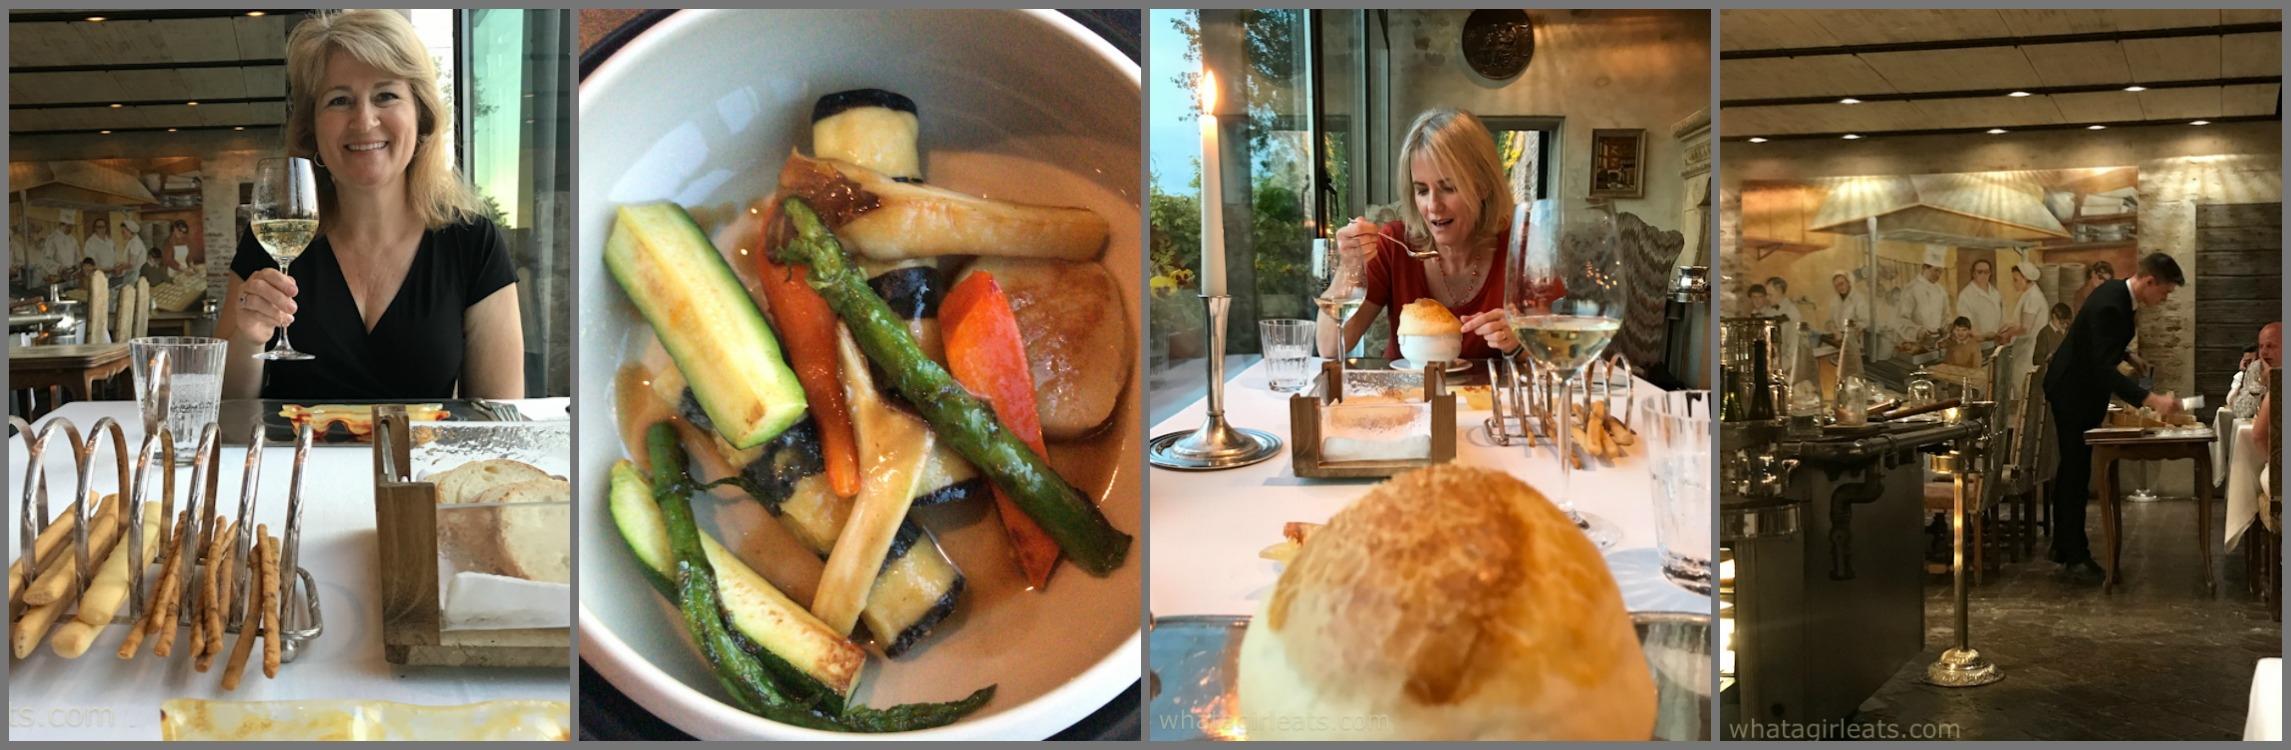 collage of slow food in emilia romagna